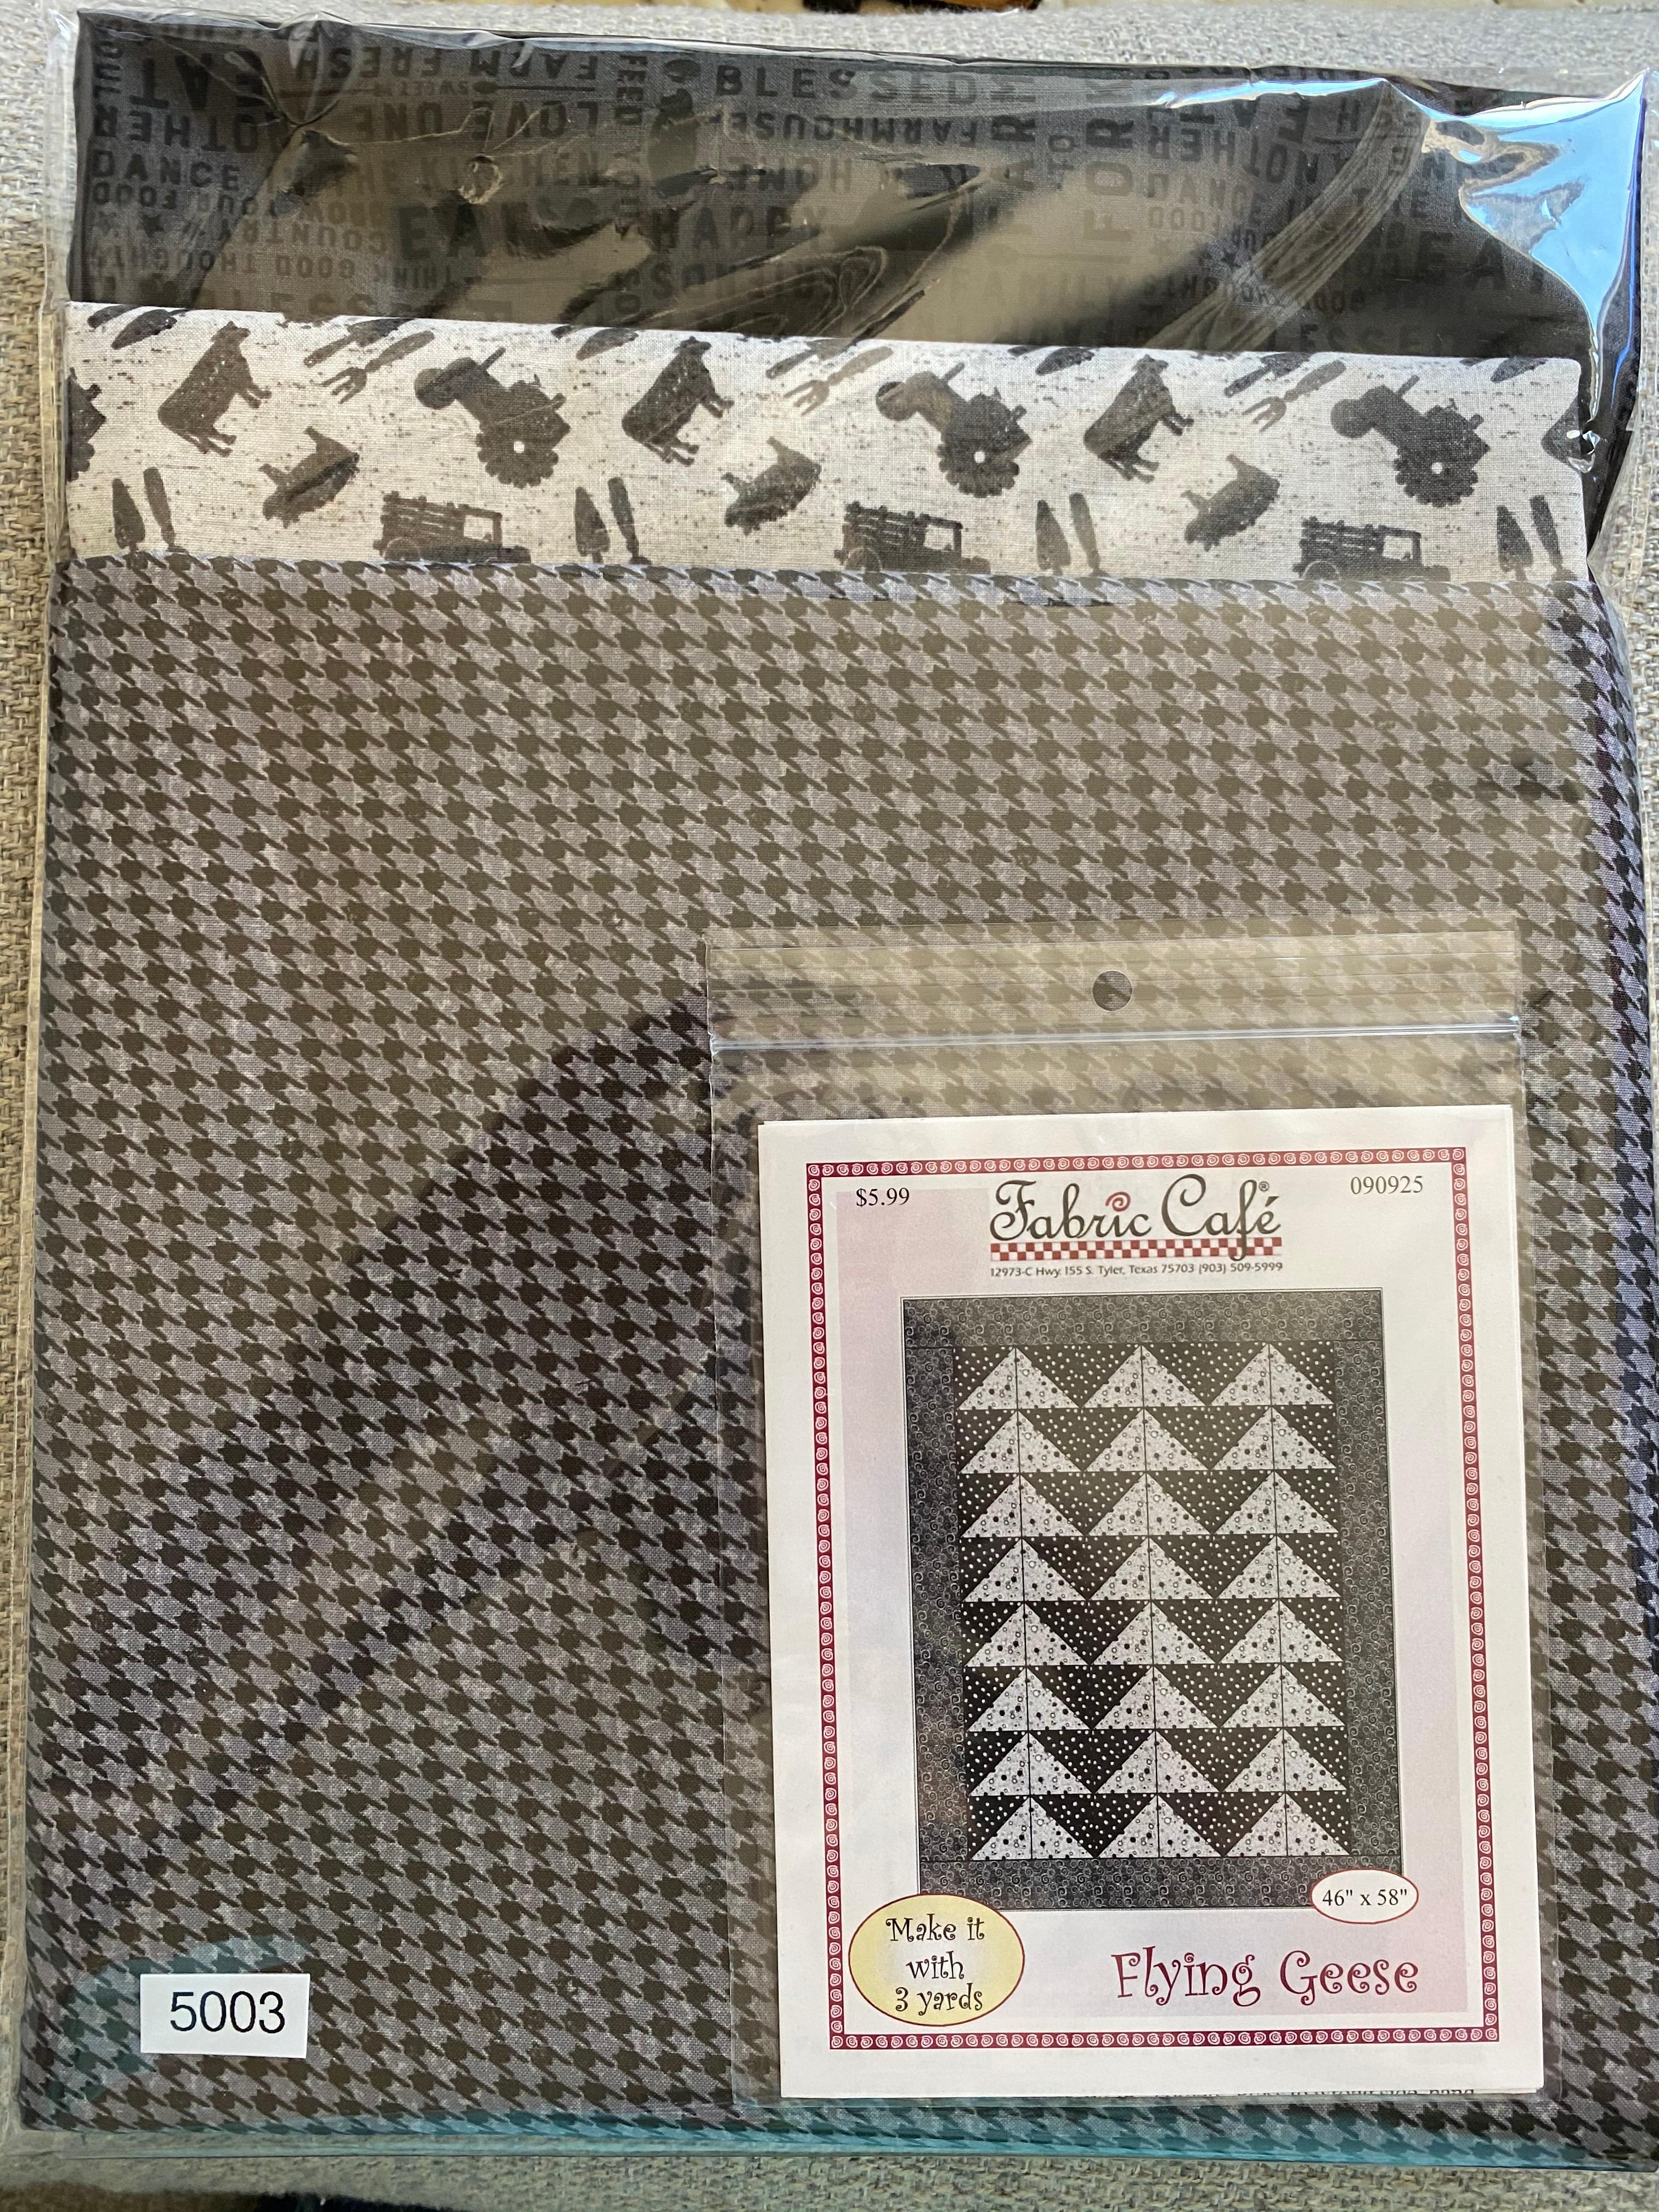 Flying Farm Quilt 3 Yard Quilt Kit #5003